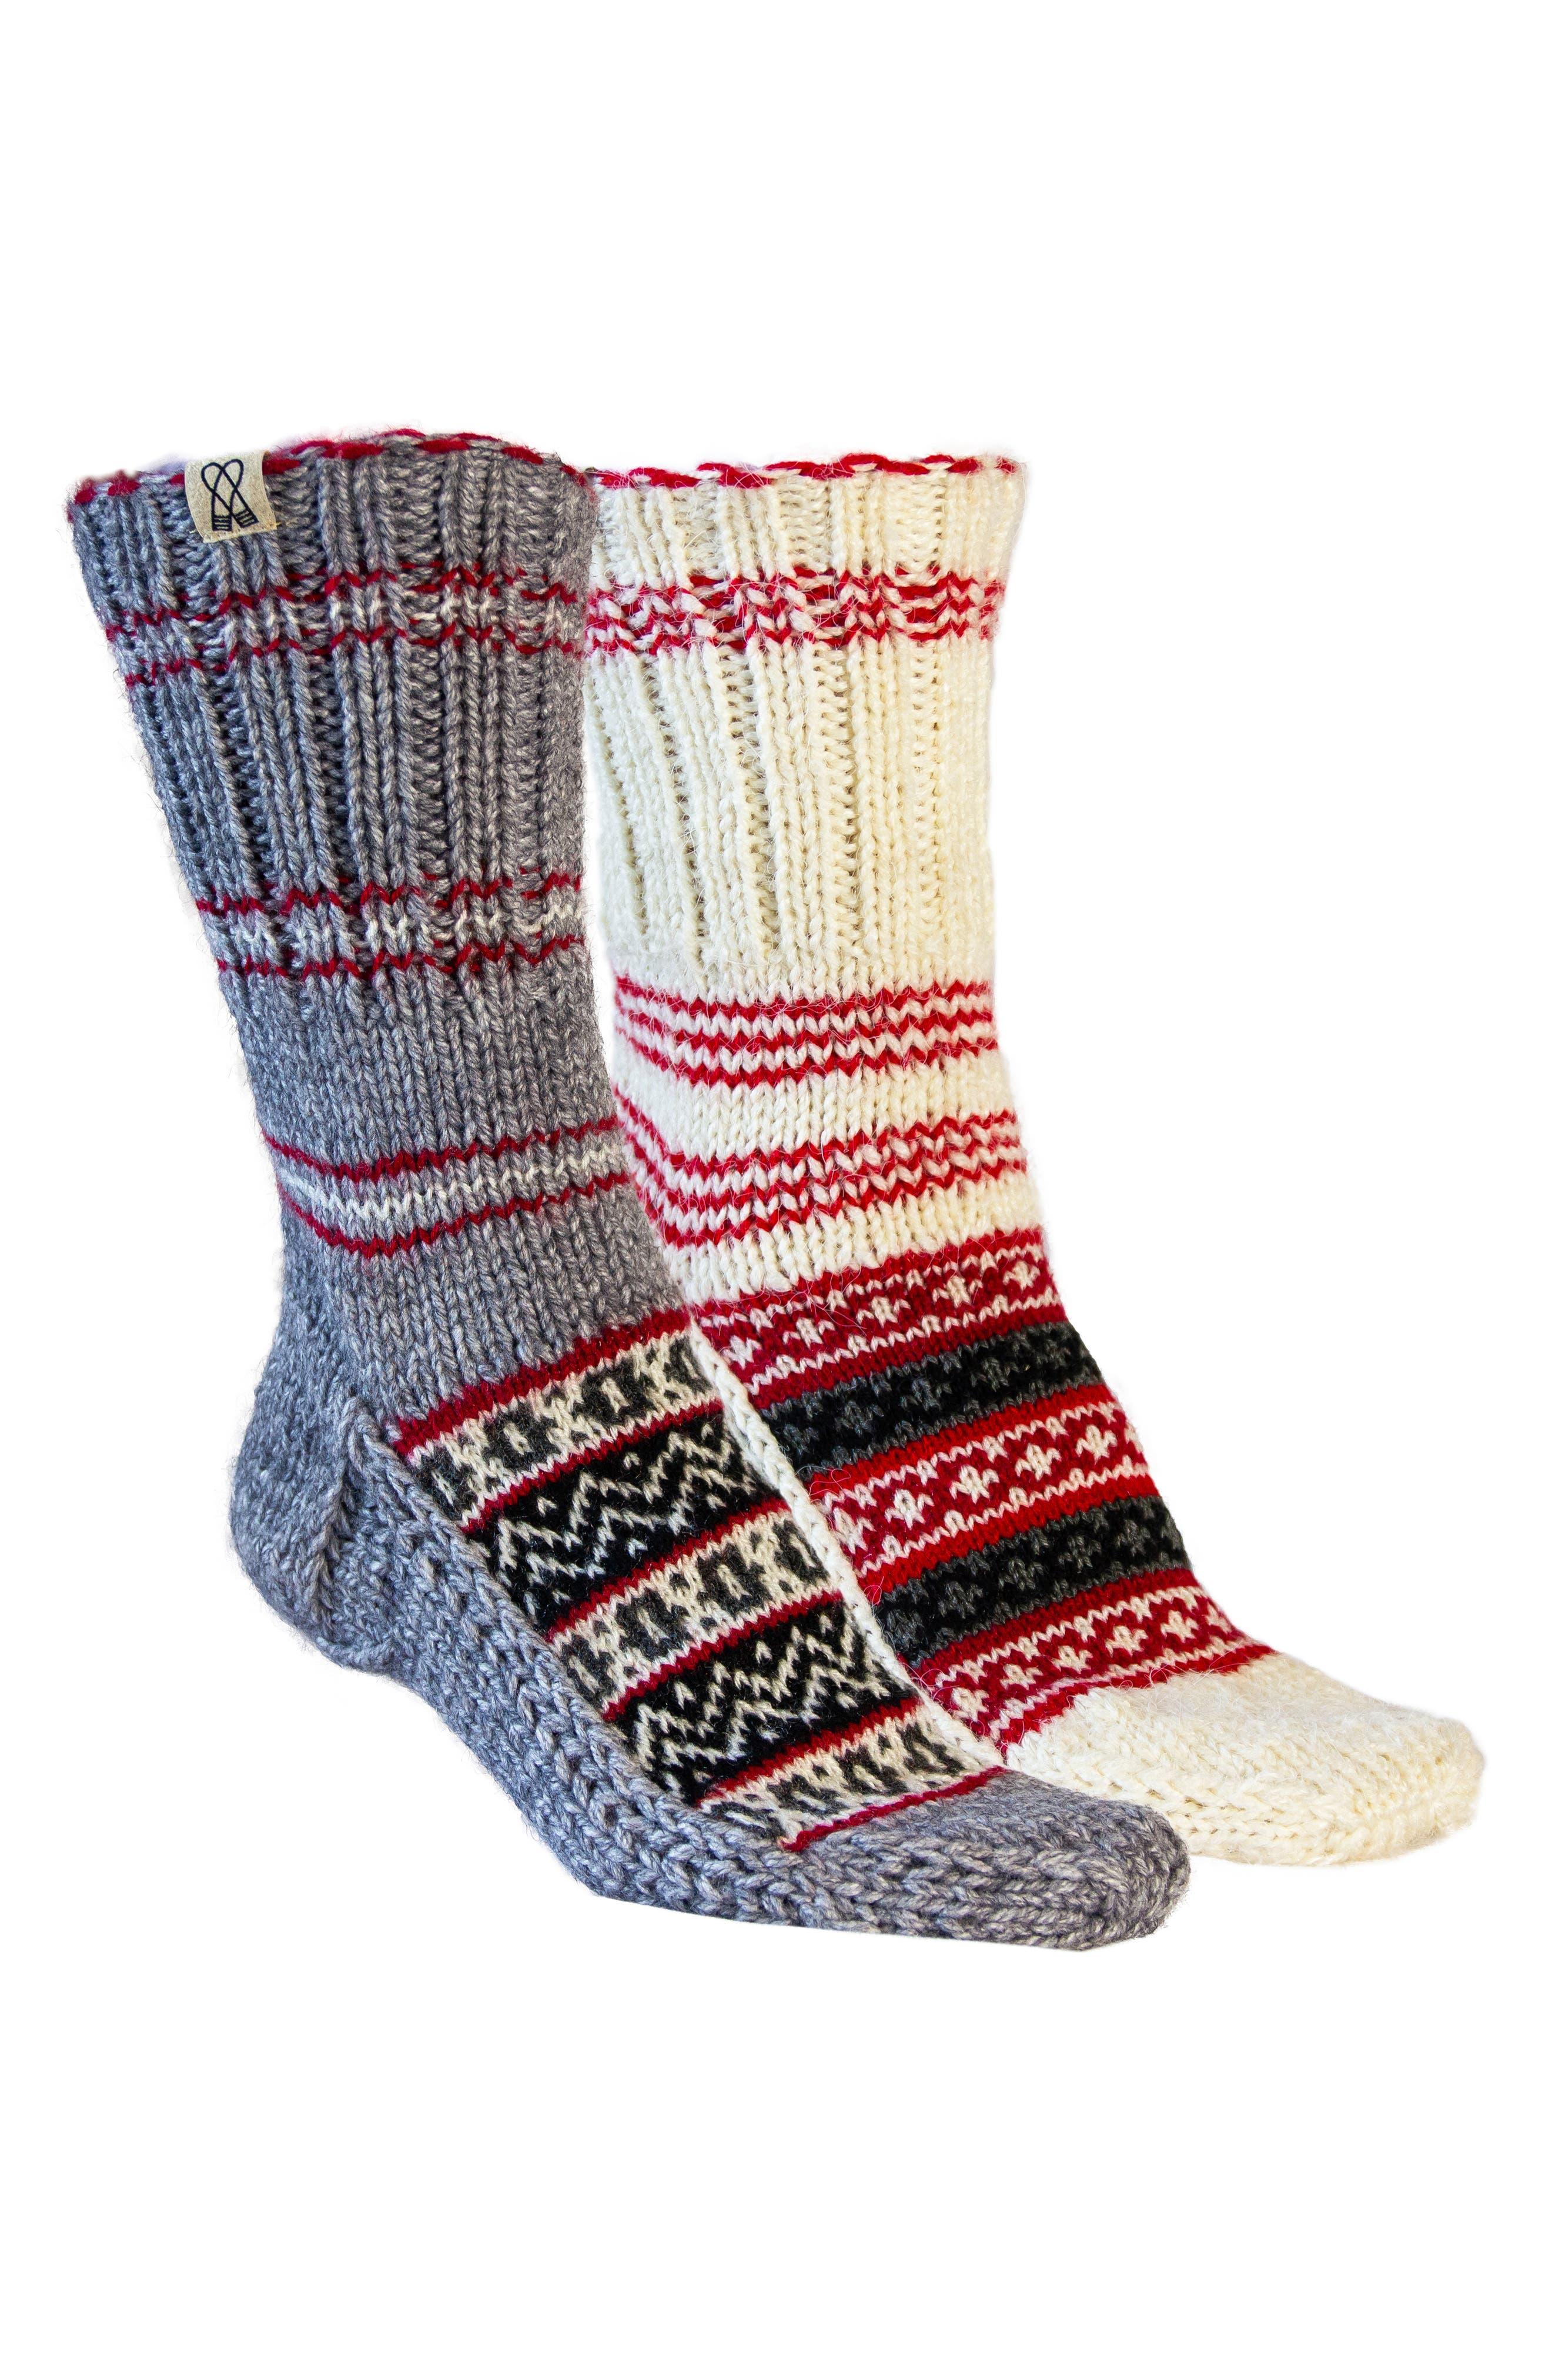 Women's Northern Hope Assorted 2-Pack Crew Socks